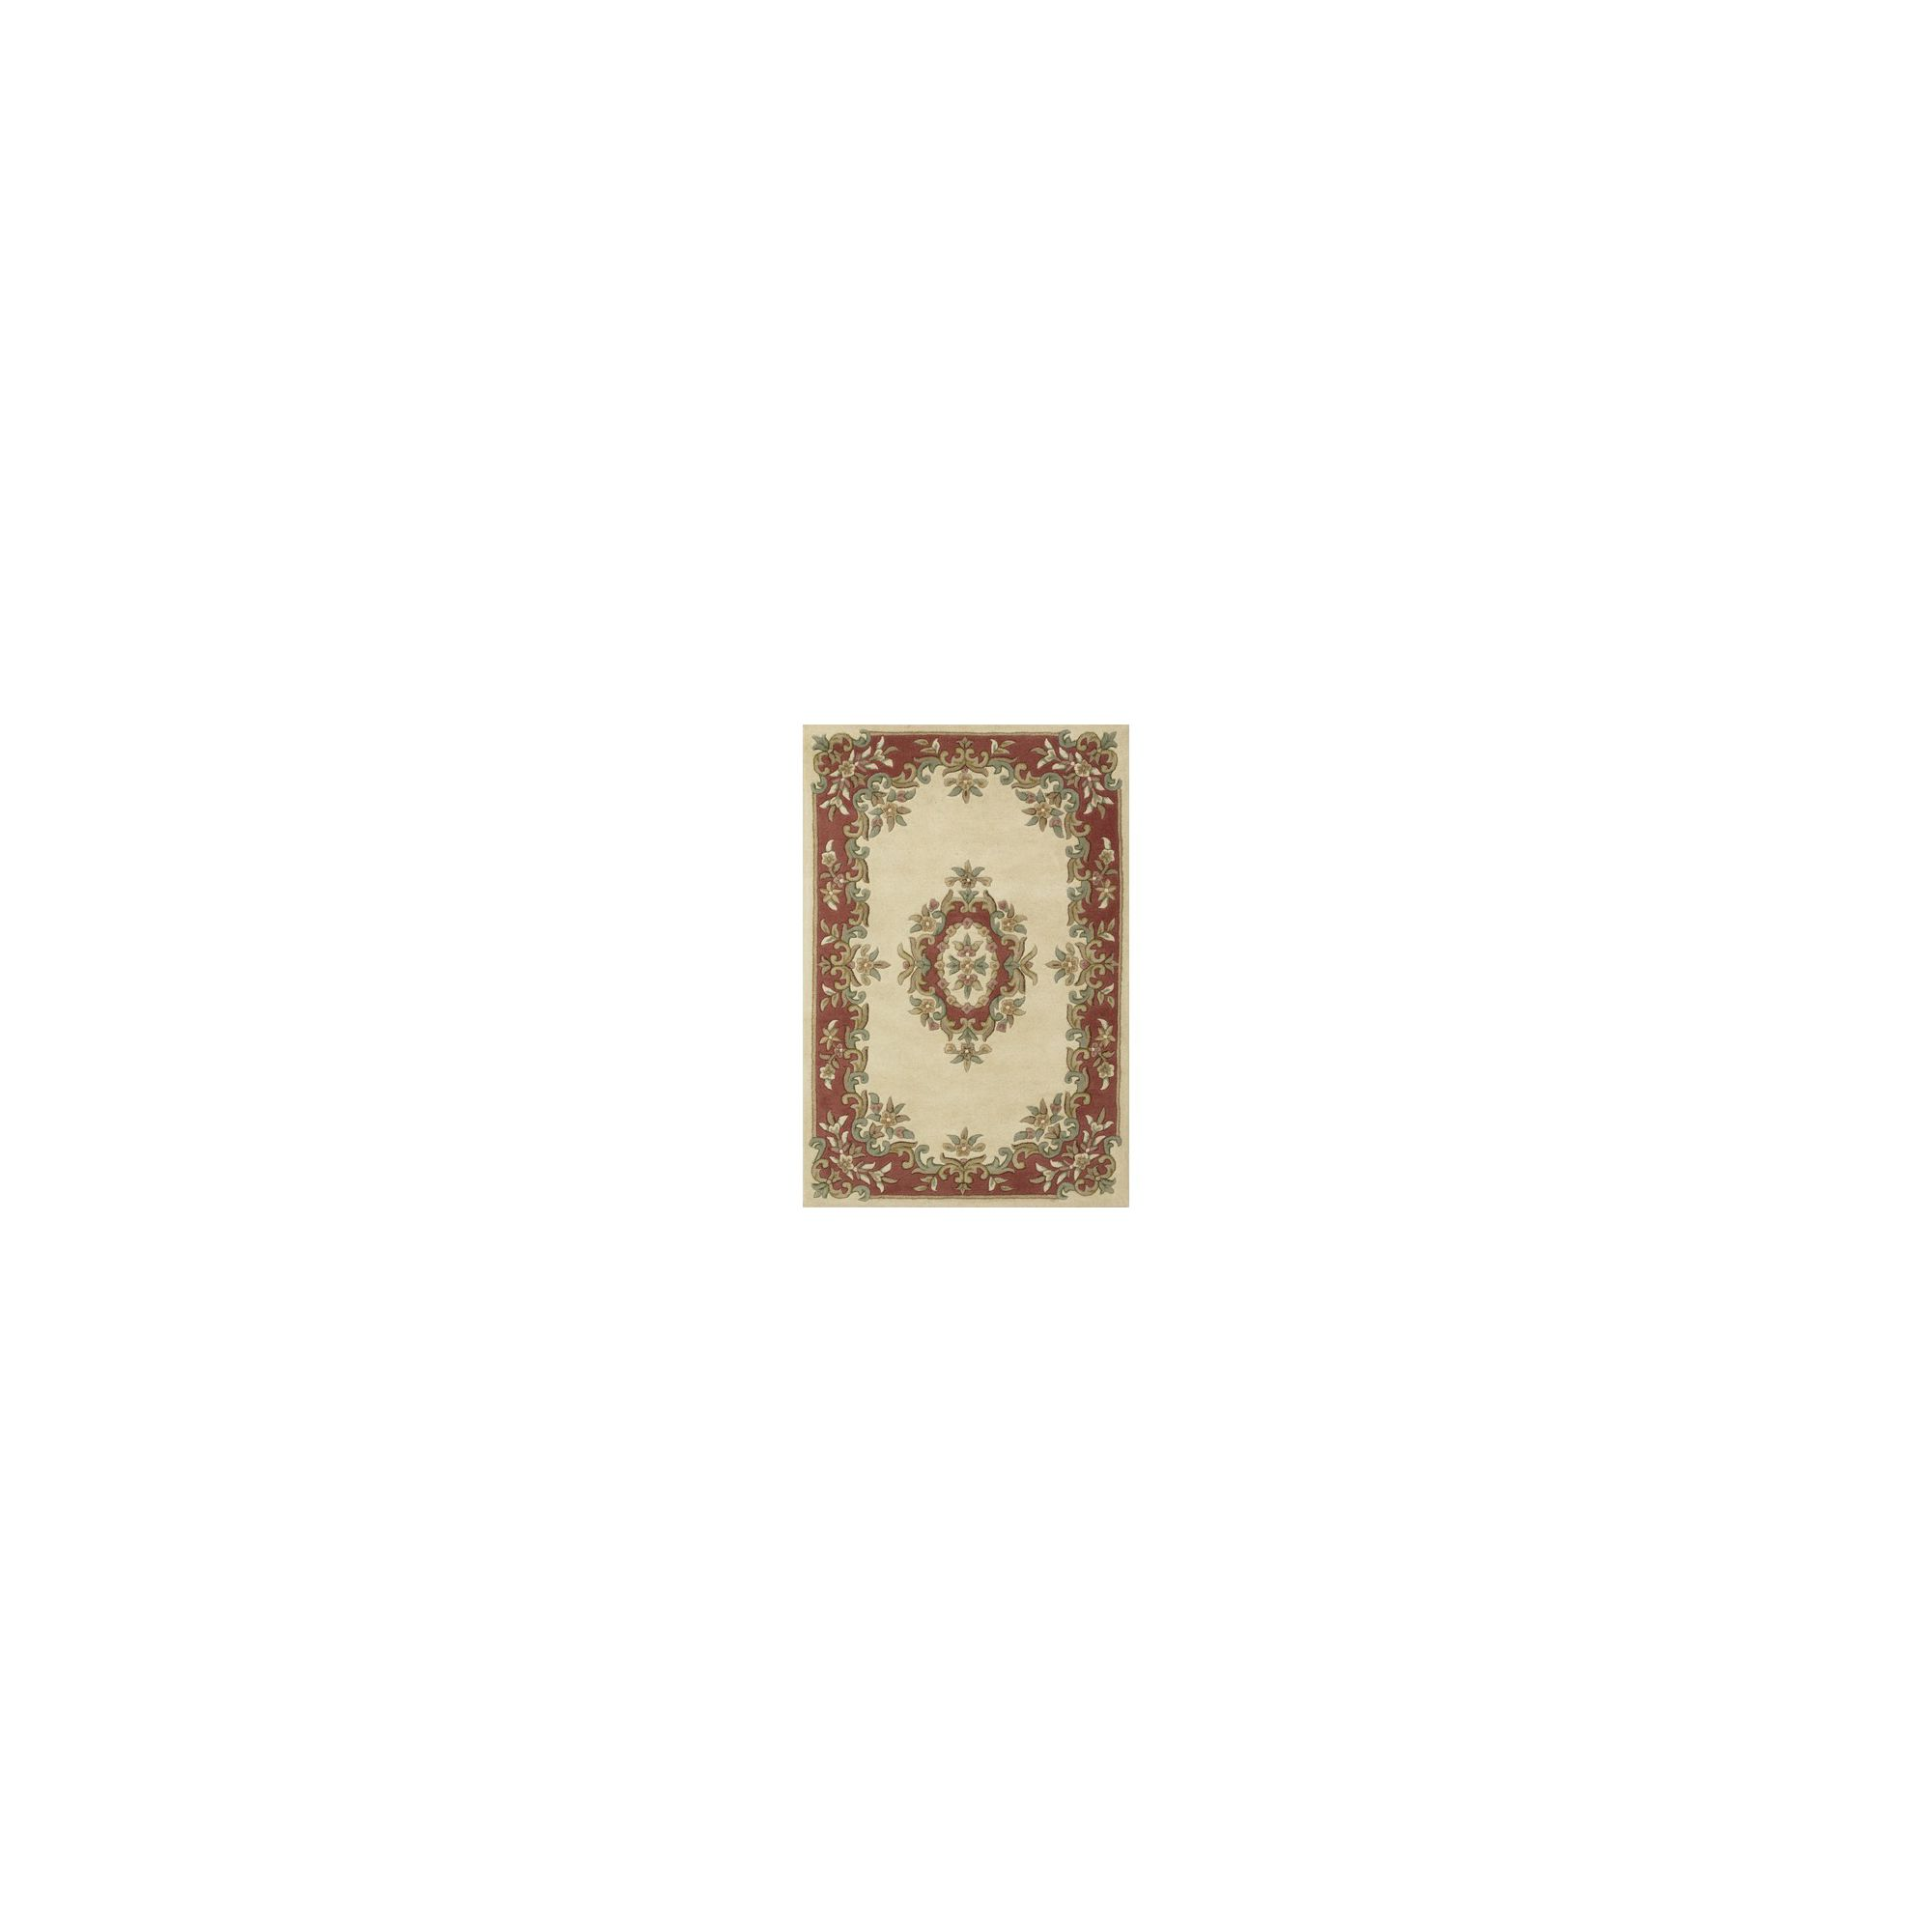 Brook Lane Rugs Royal Cream/Rose Classic Oriental Rug - 160cm x 235cm at Tesco Direct